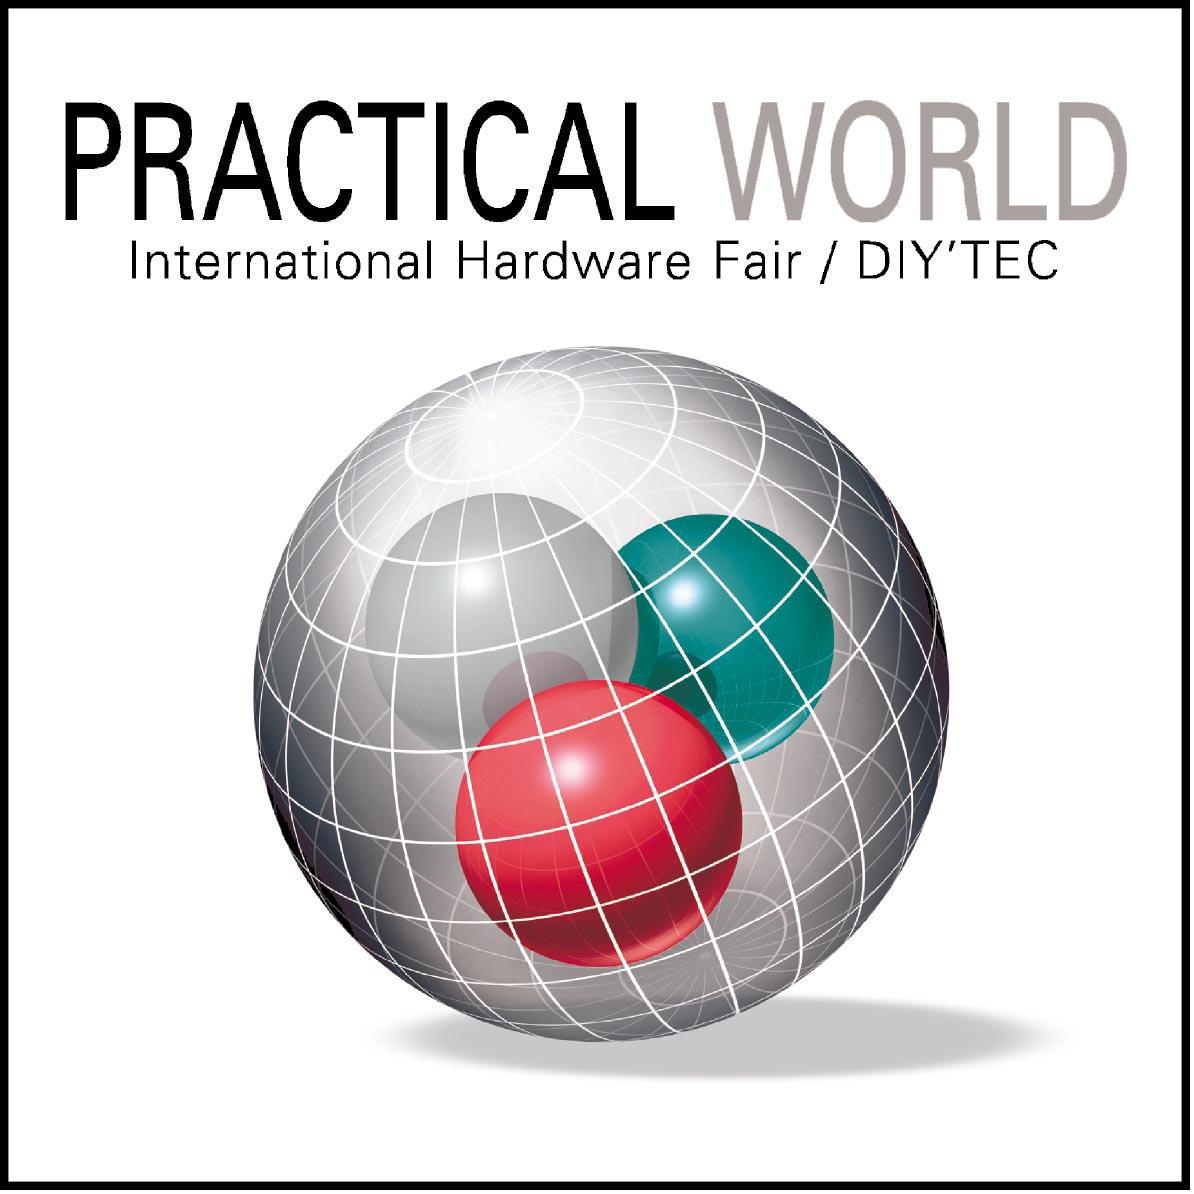 International Hardware Trade Fair 2005, Colonge